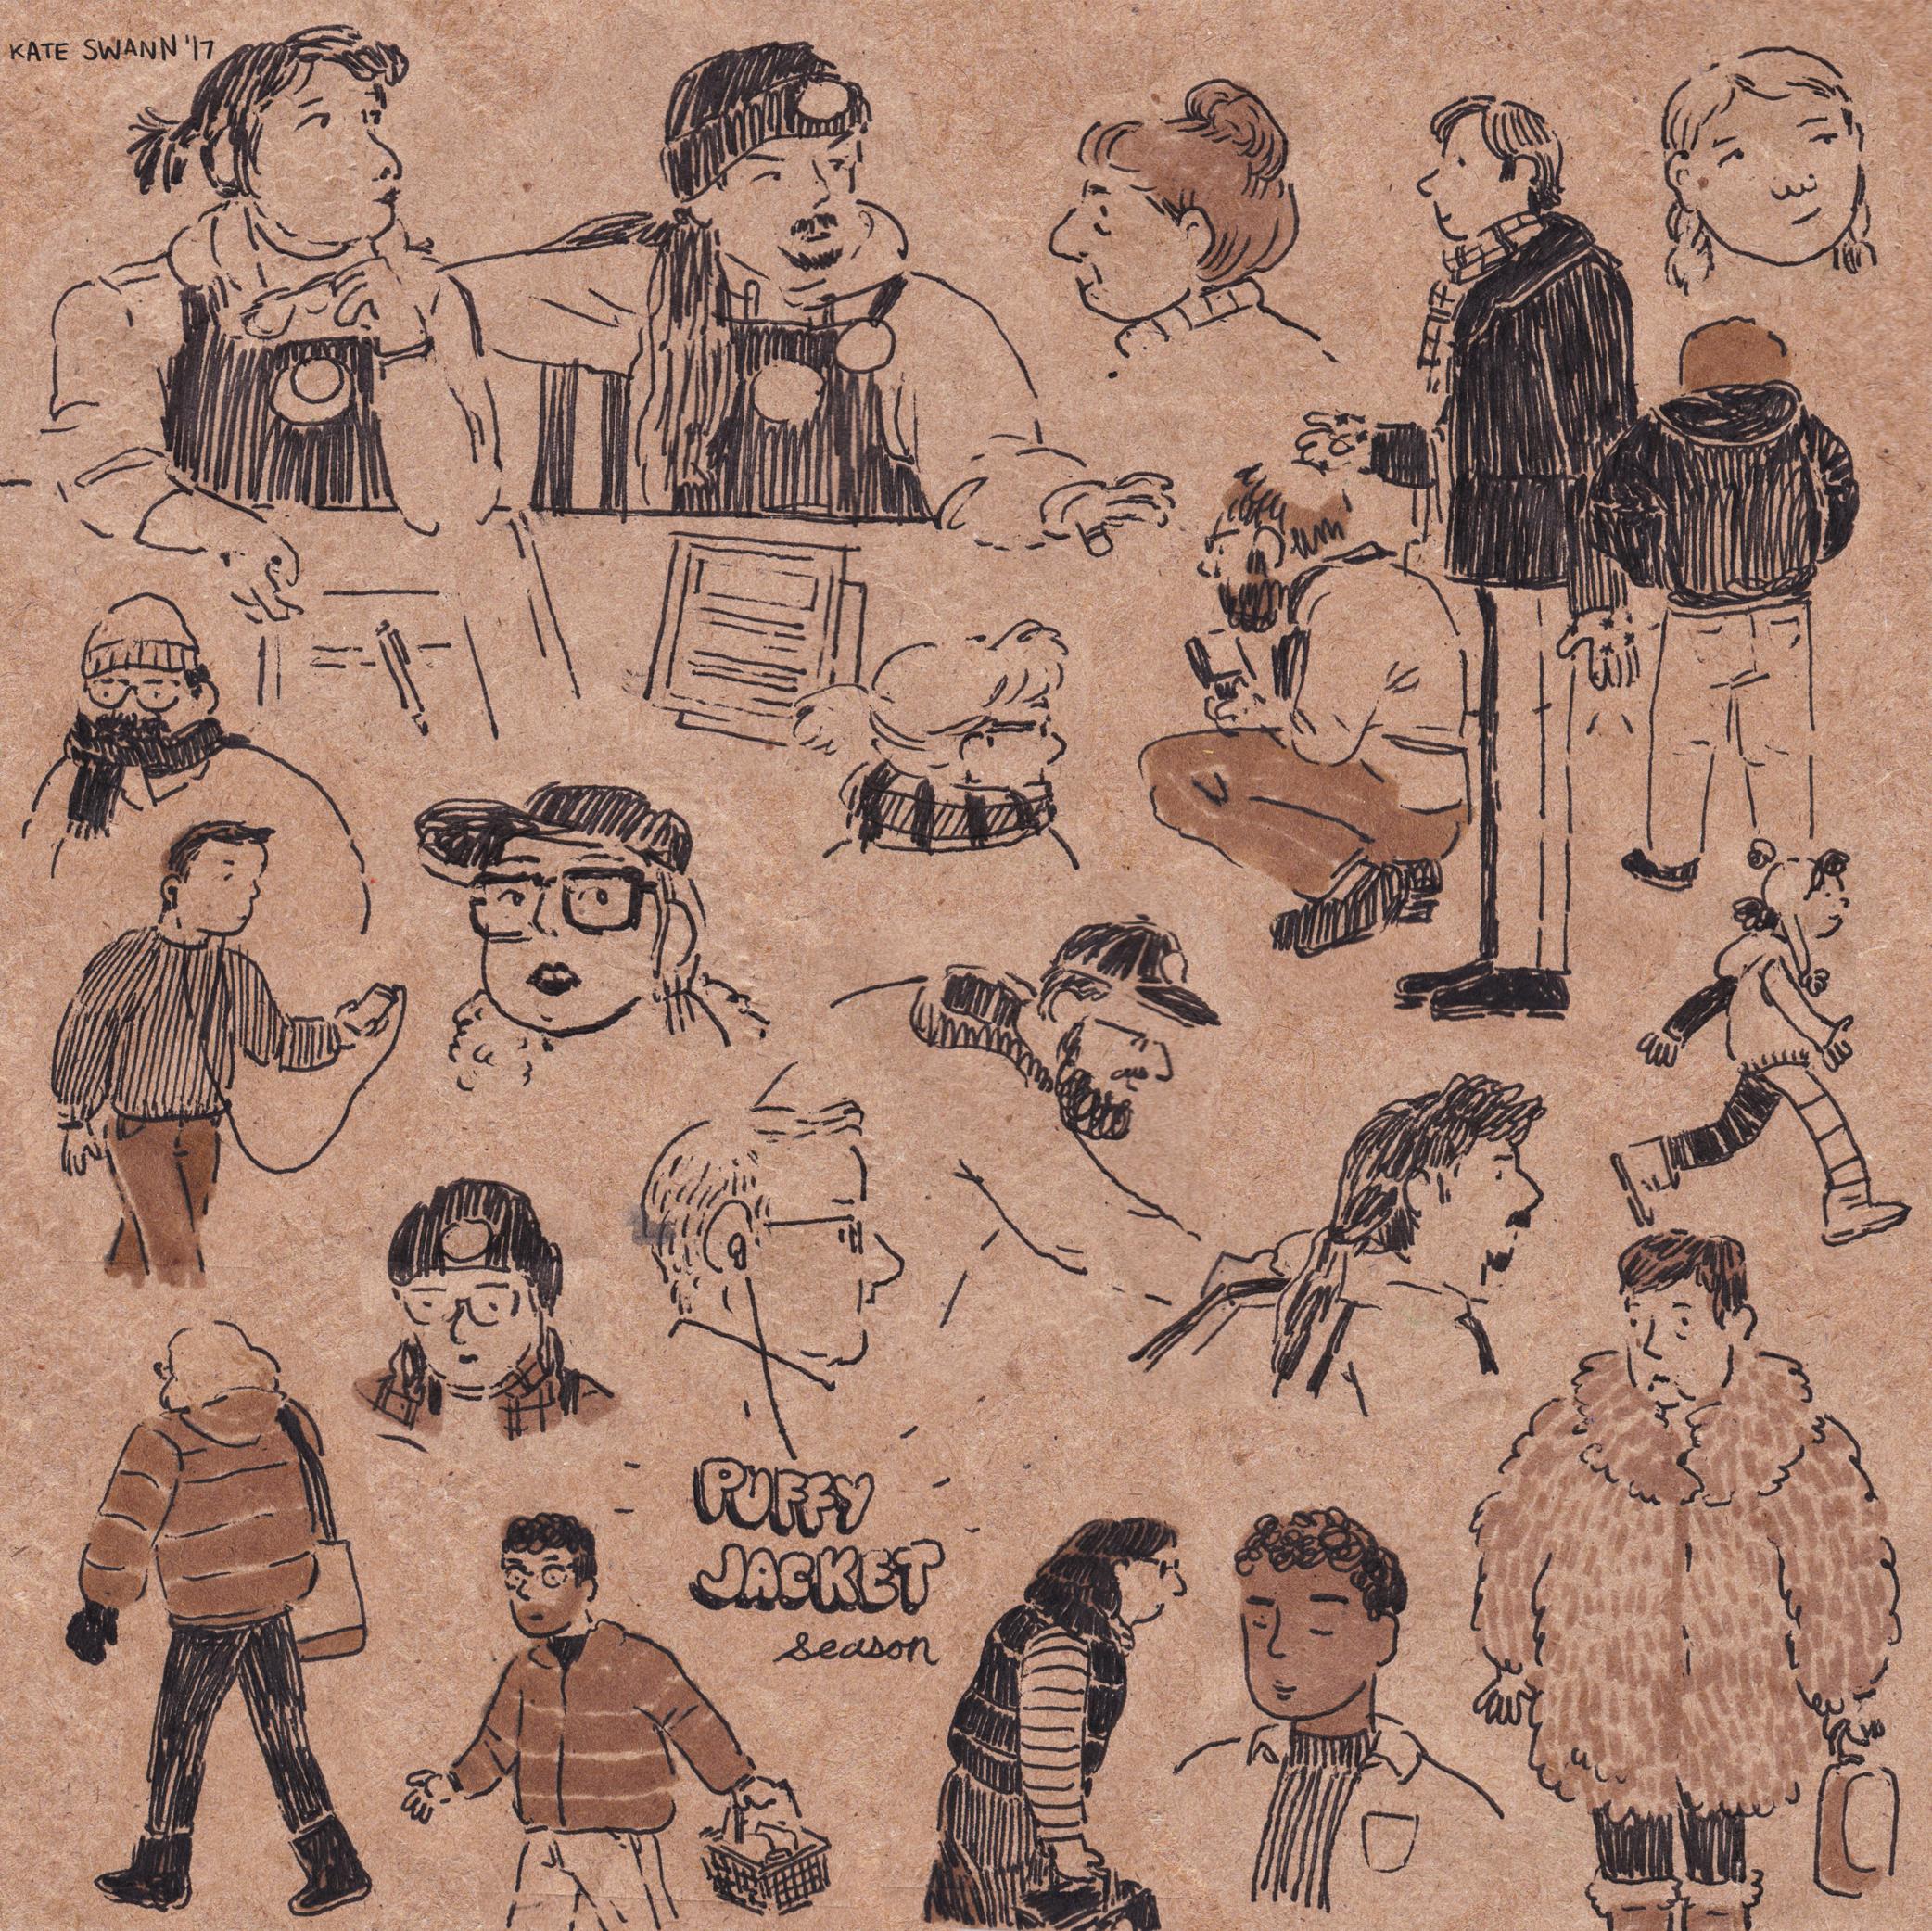 sketchdump12.17.png